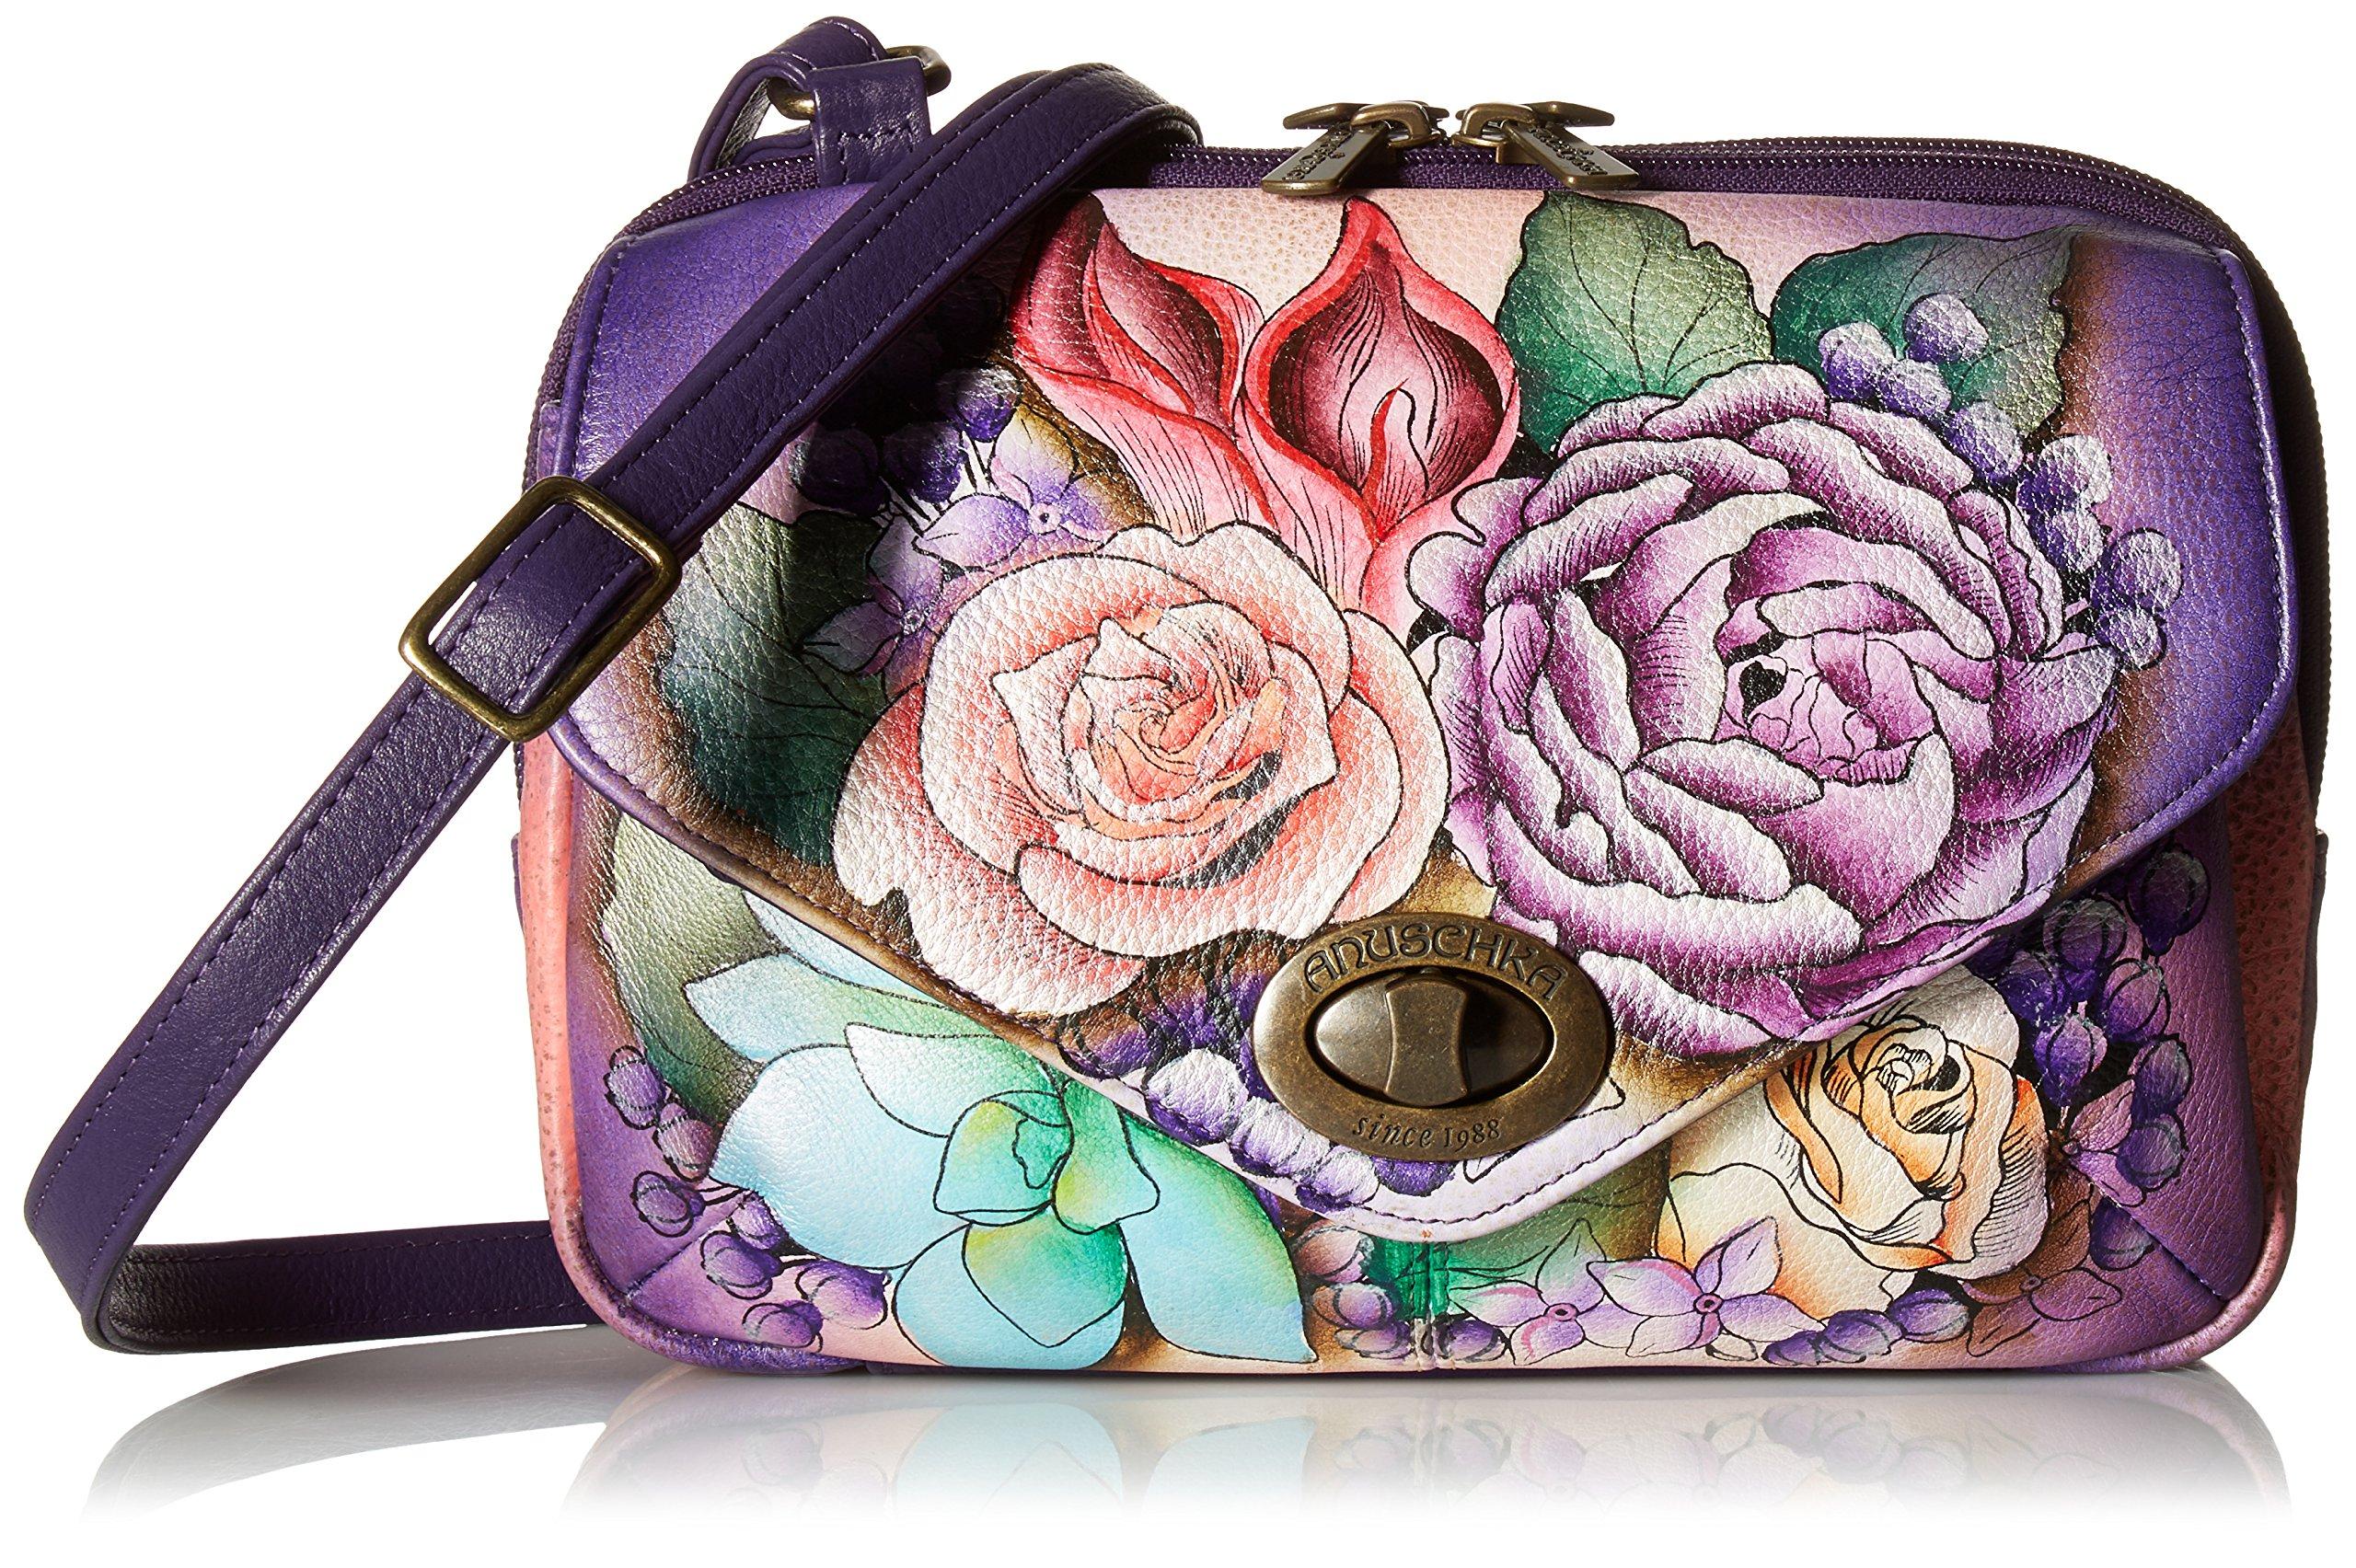 Anuschka Handpainted Painted Convertible Travel Organizer,Lush Lilac, Llc-Lush Lilac